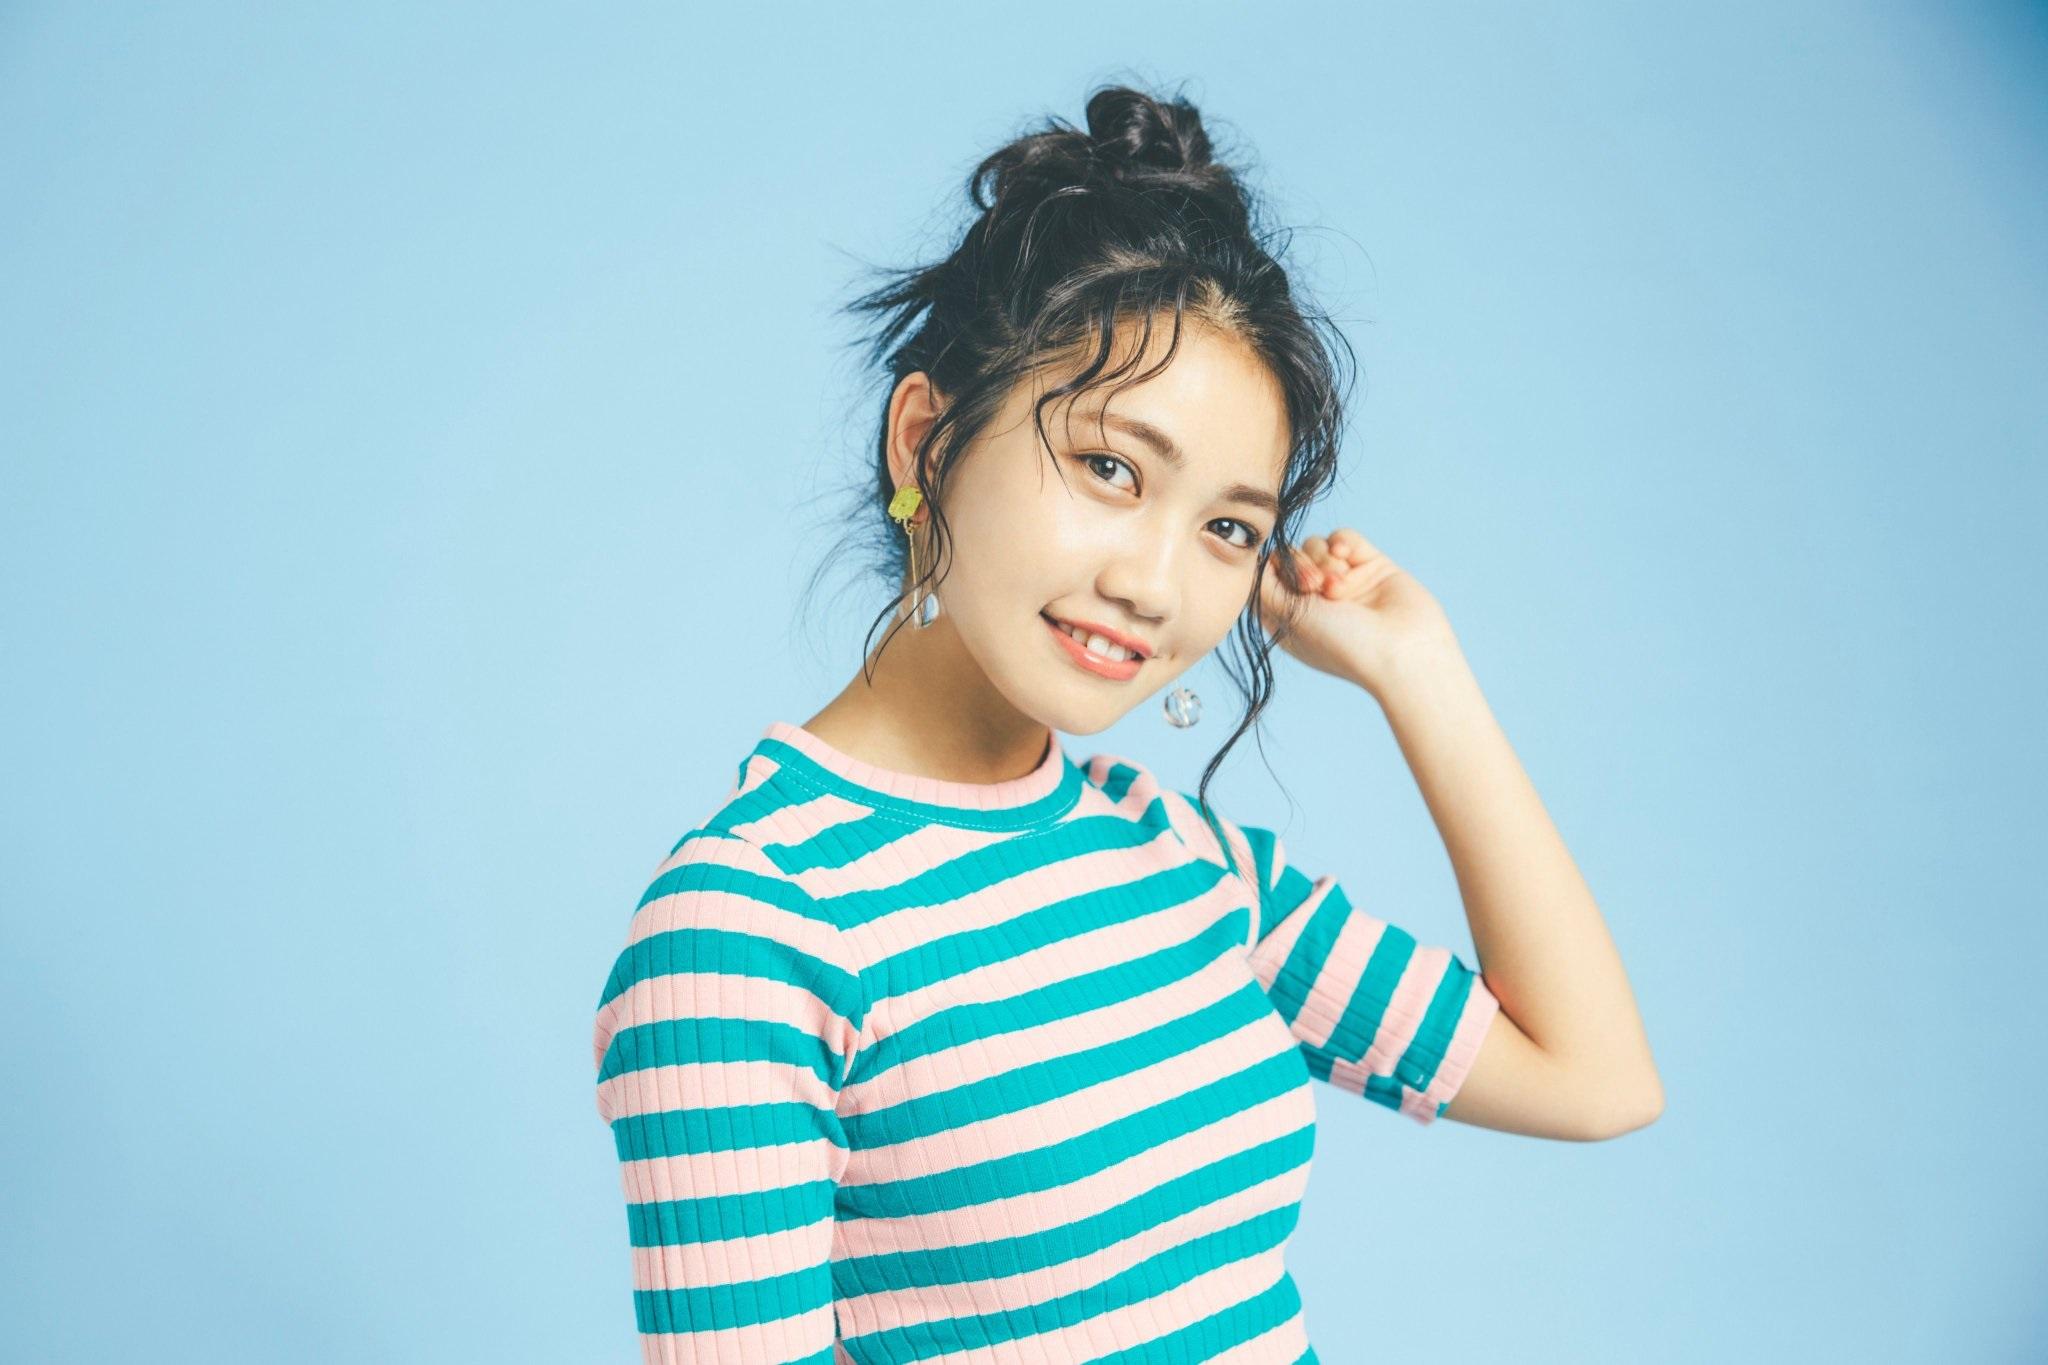 Inoue Sonoko